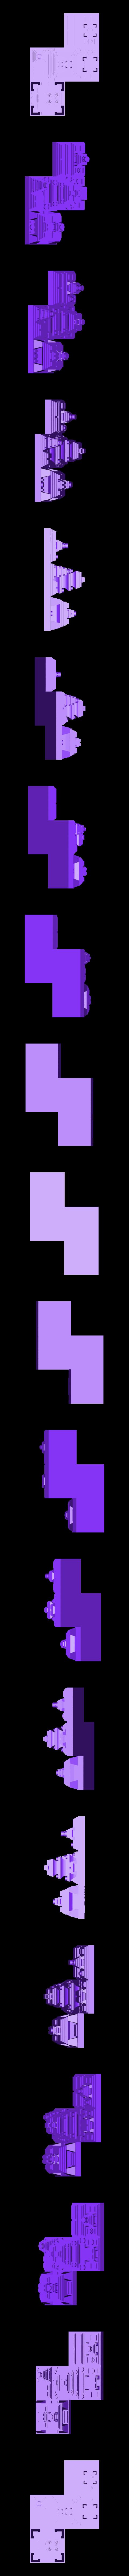 tetris_cities_Z.stl Download free STL file Tetris Heart Puzzle • Design to 3D print, ferjerez3d